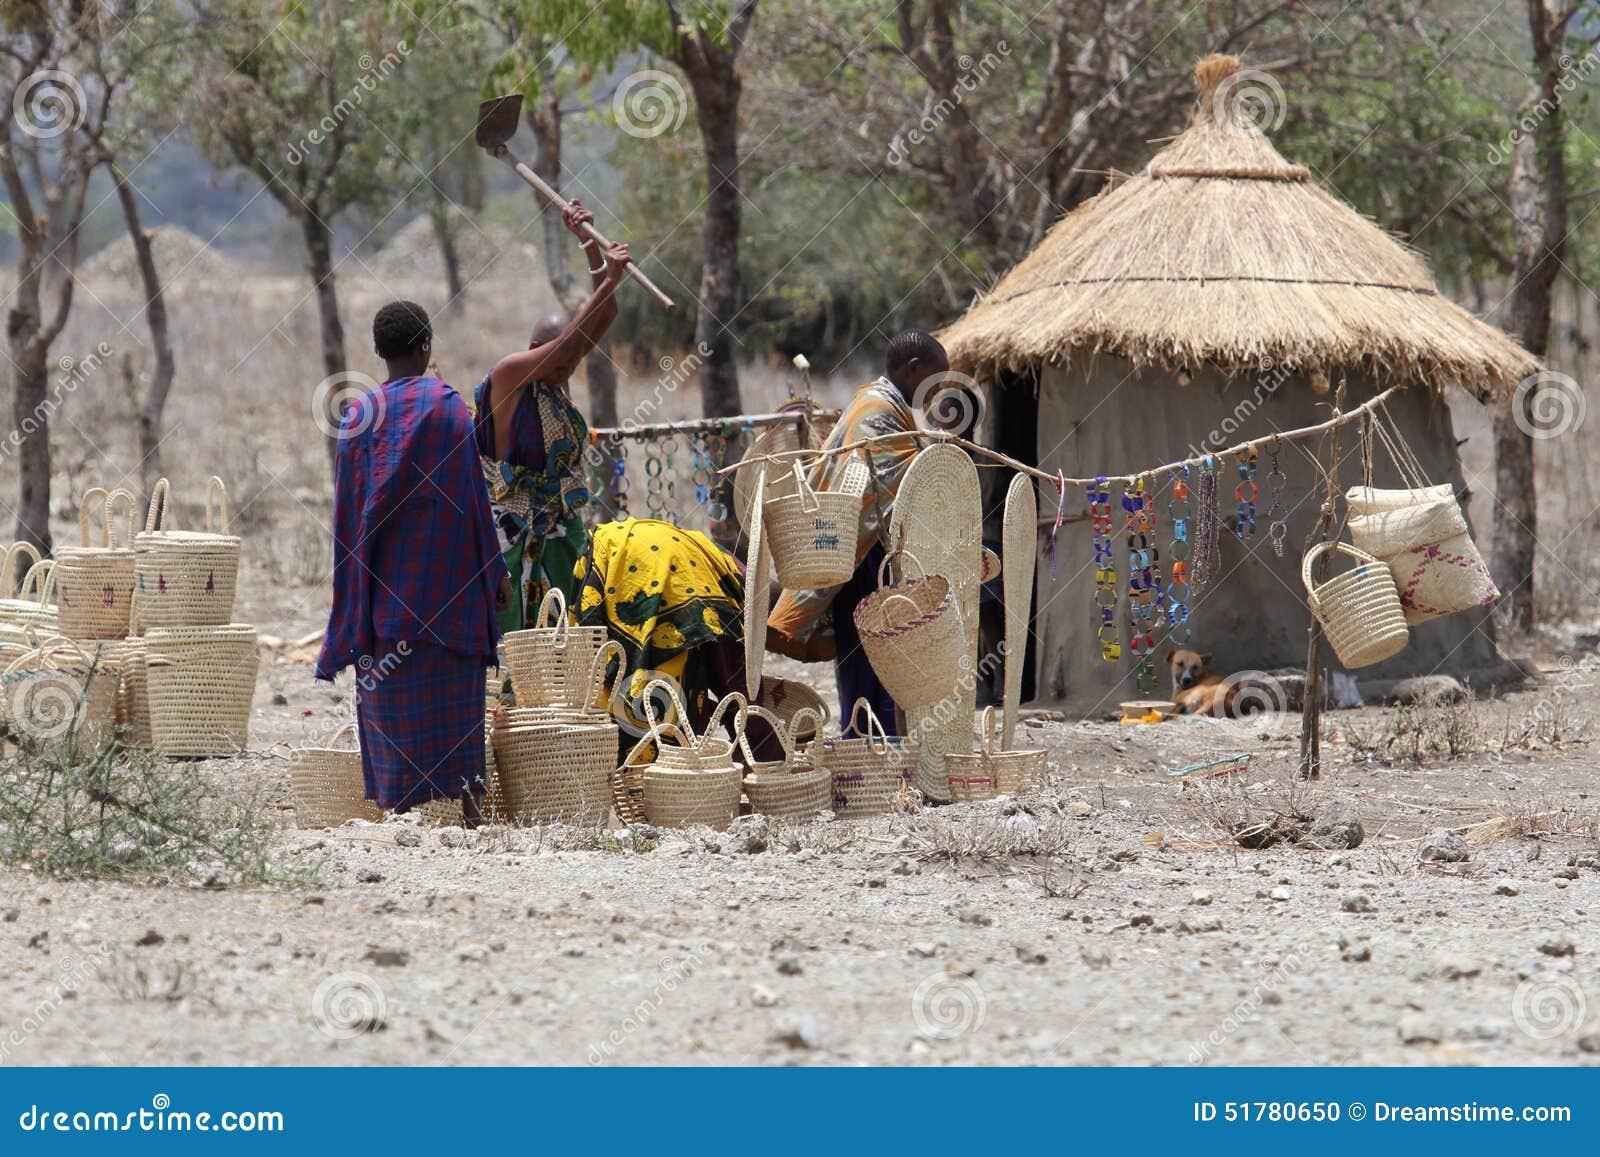 African village in Botswana